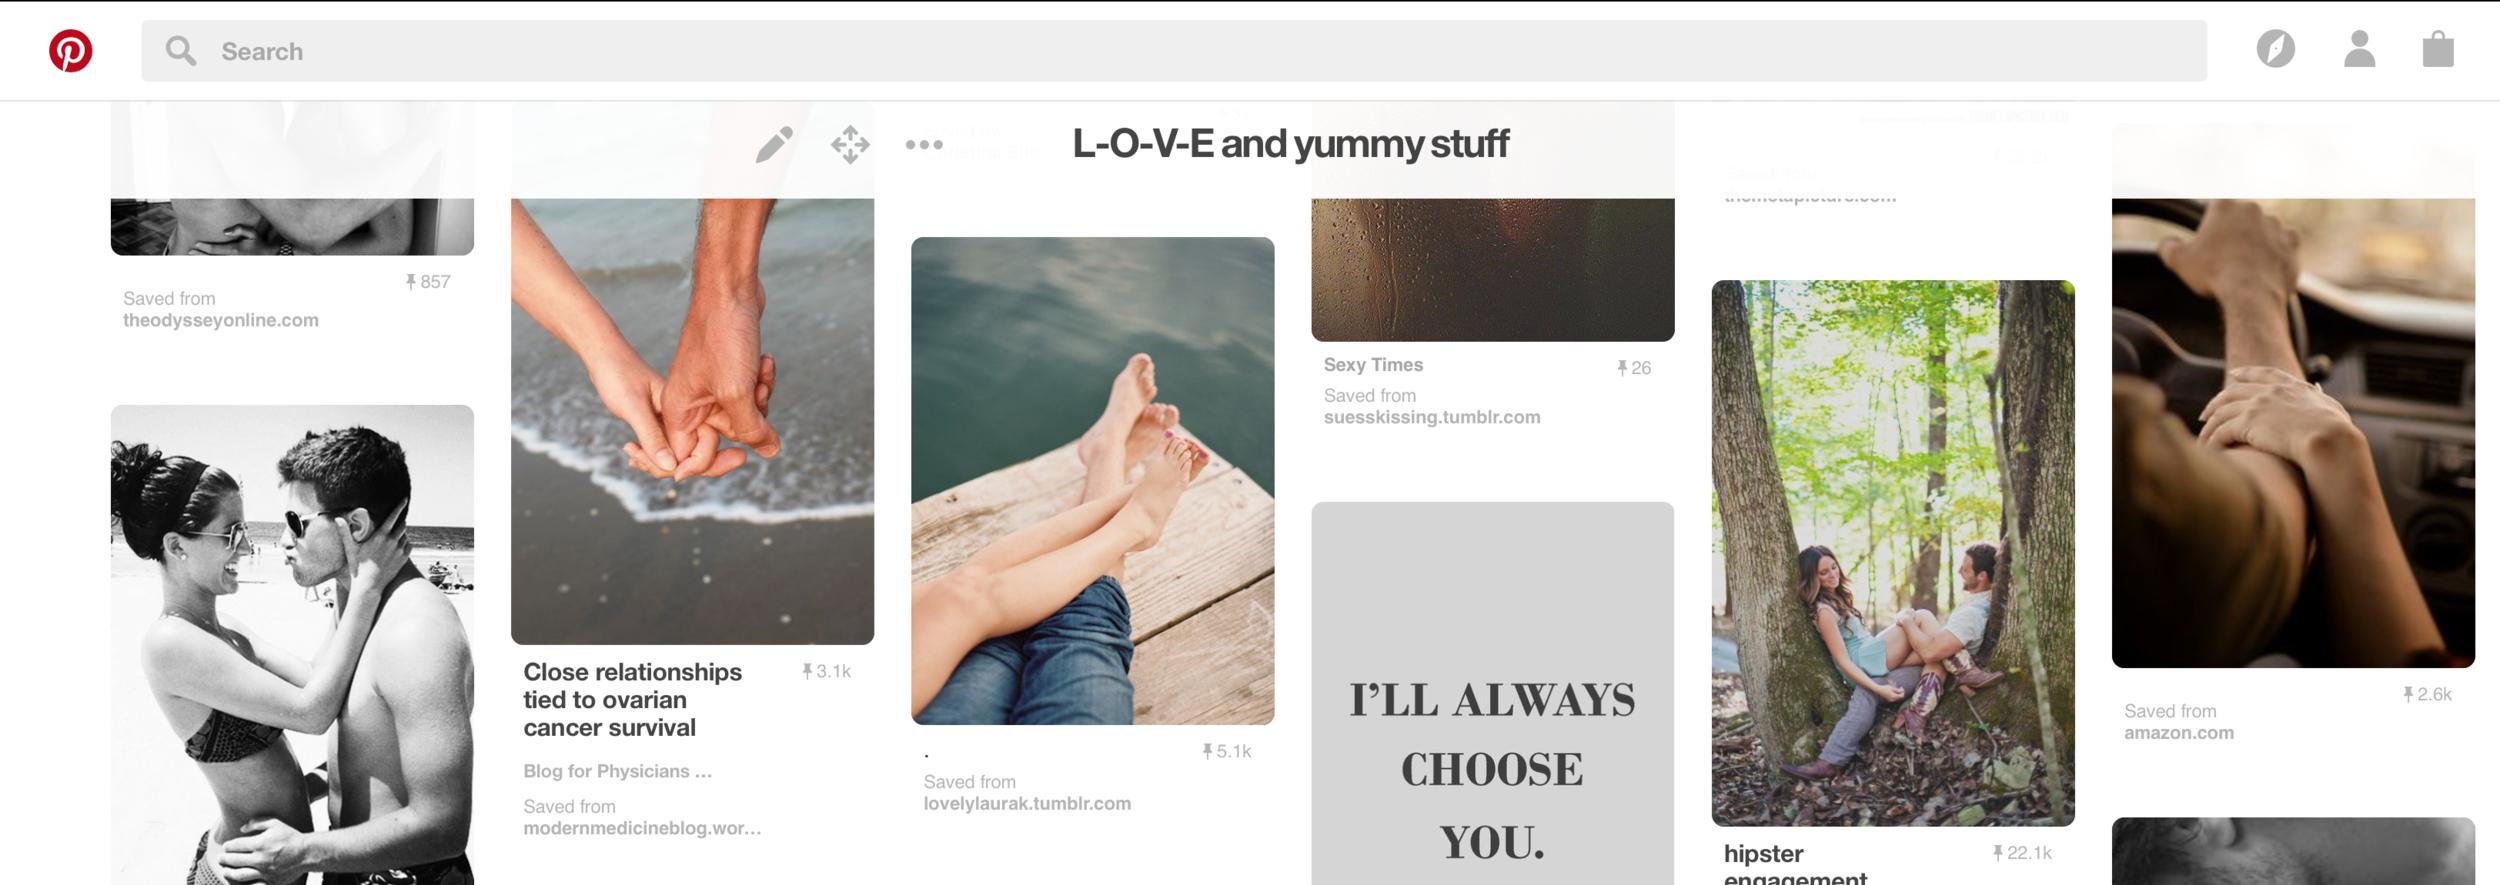 Christina Elle Pinterest - Love and Yummy Stuff.png